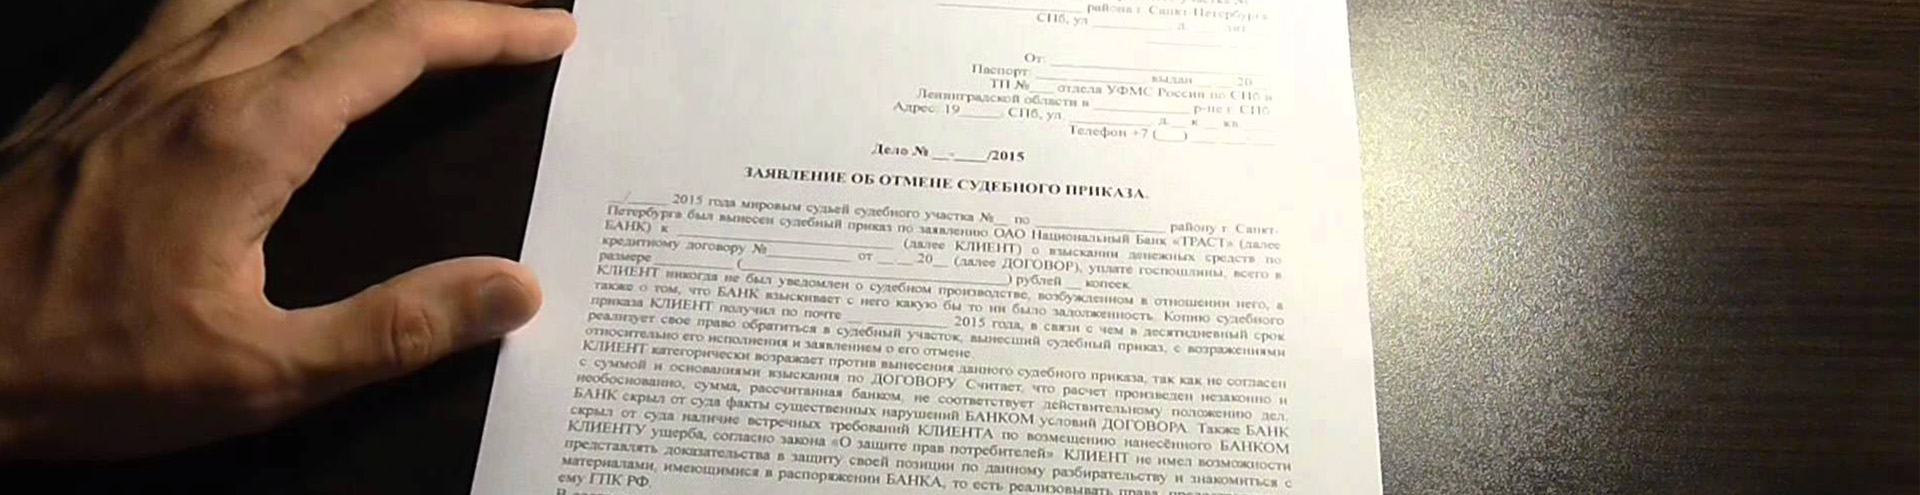 отмена судебного приказа в Астрахани и Астраханской области